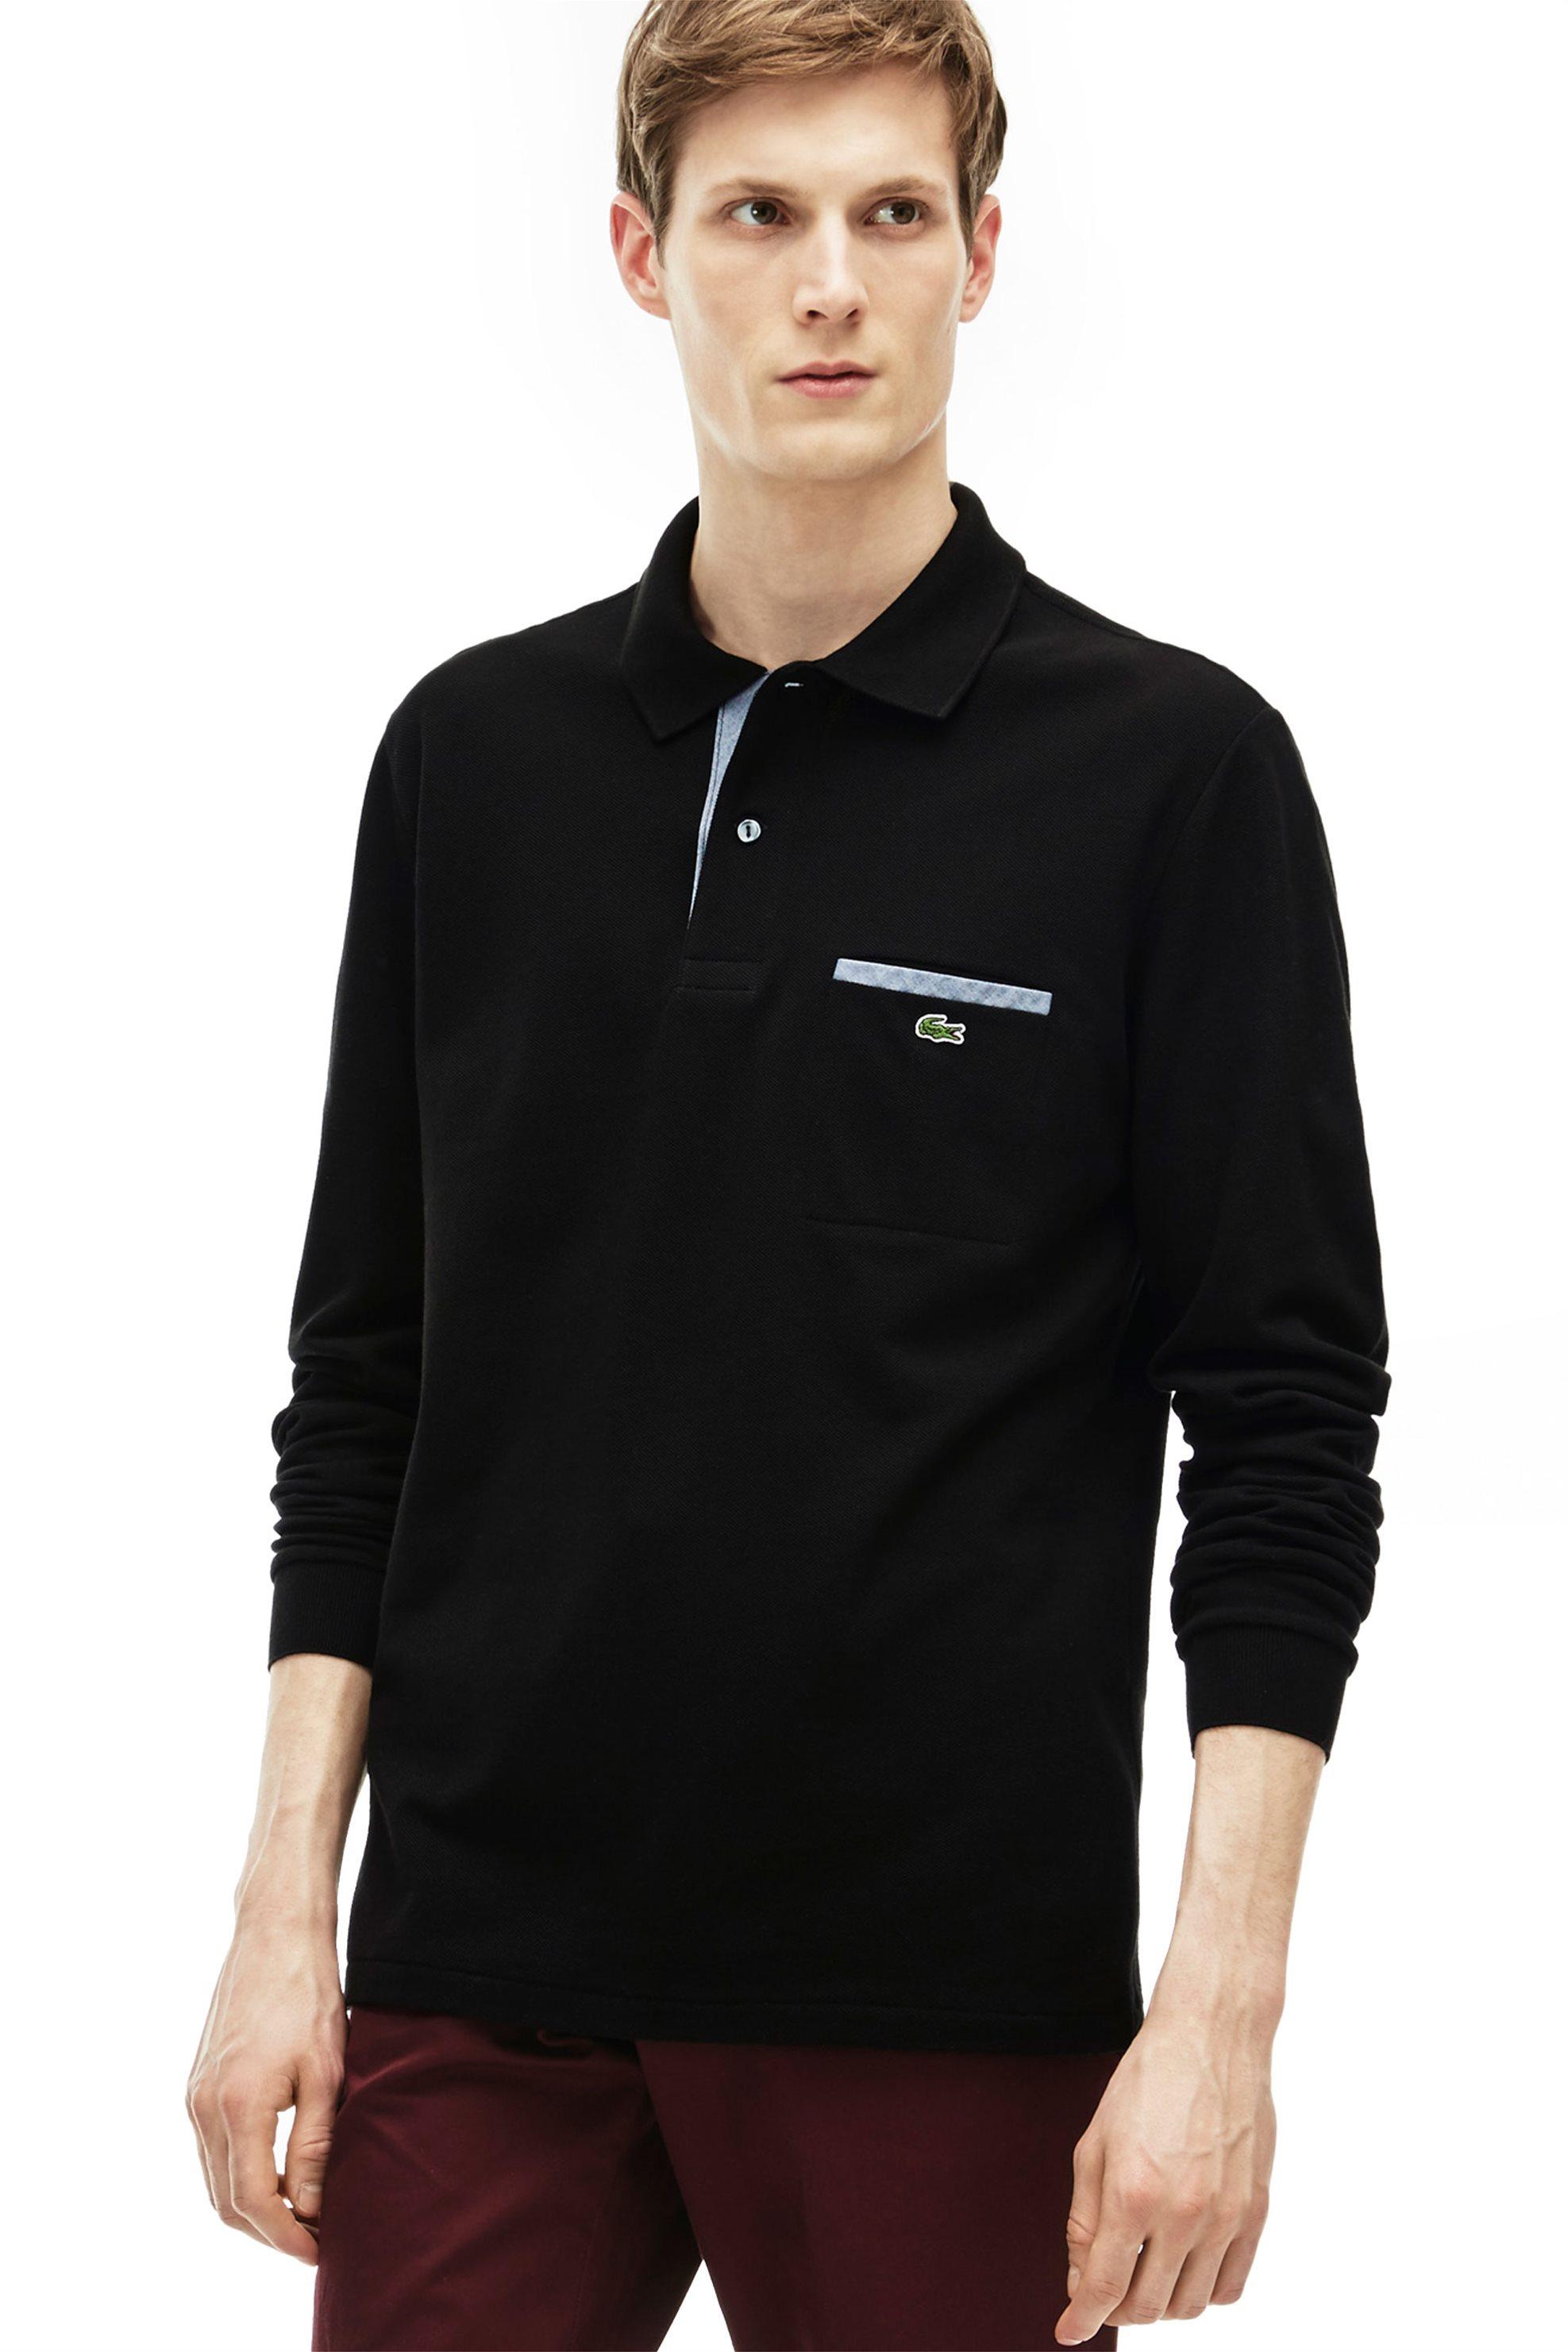 3963afd972bf Ανδρική μπλούζα polo με μακρύ μανίκι Lacoste - PH0118 - Μπλε Ηλεκτρίκ